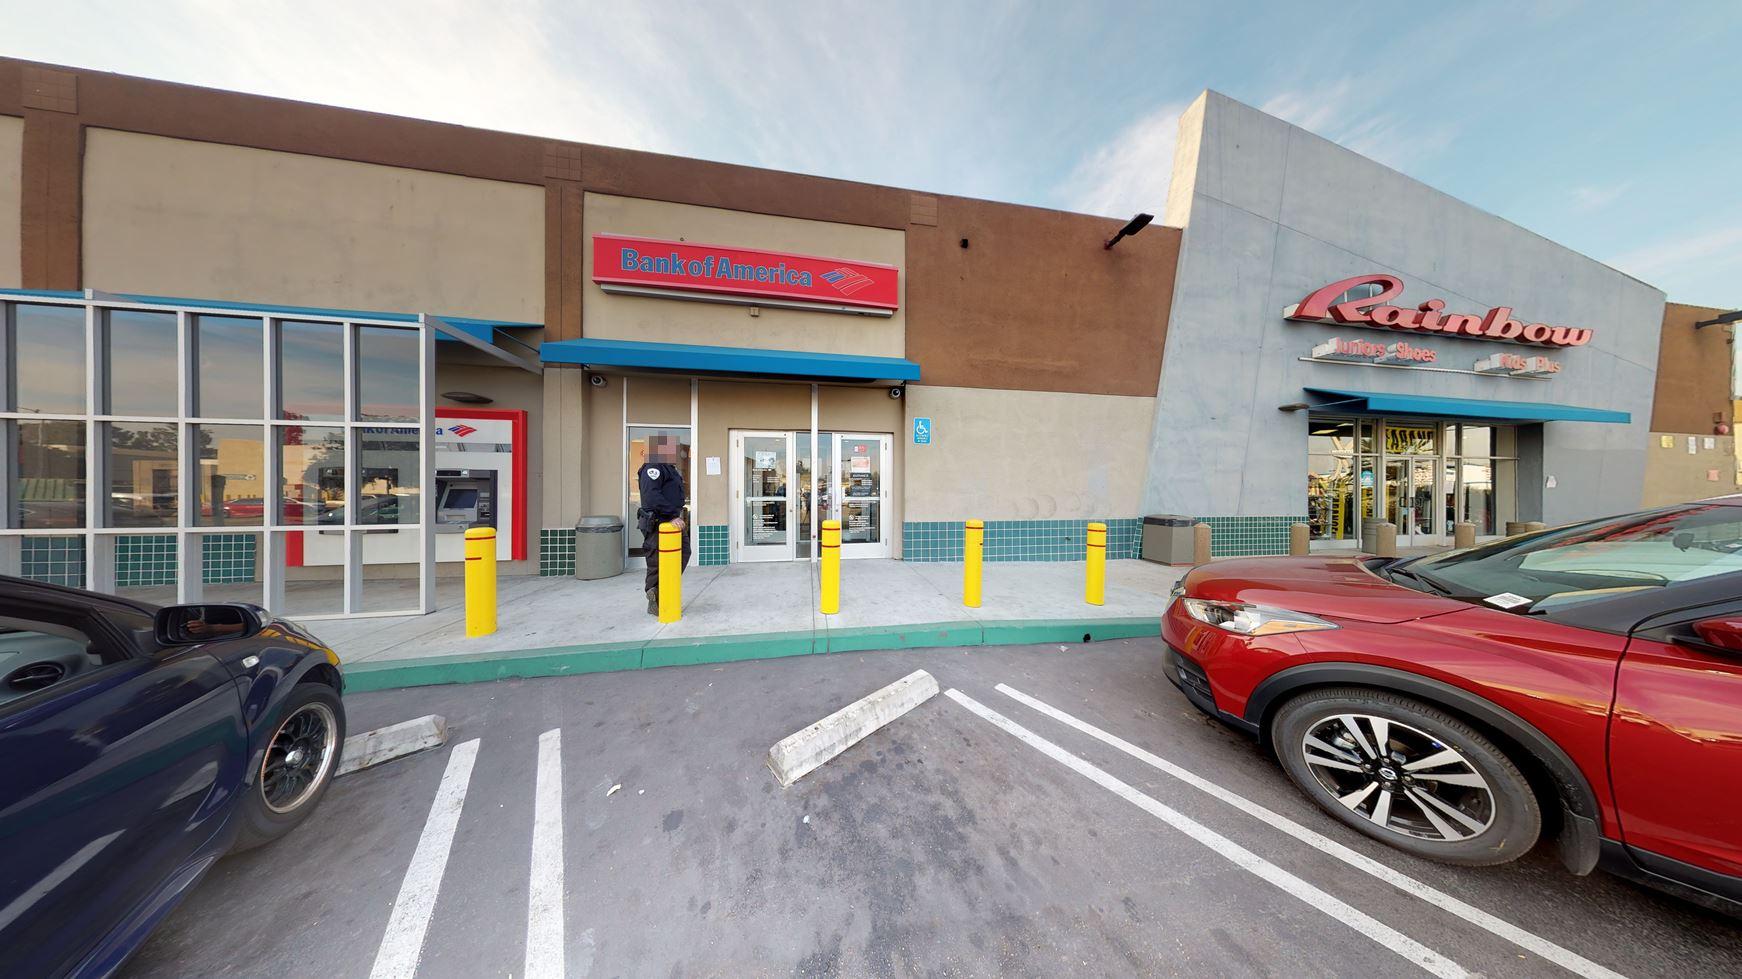 Bank of America financial center with walk-up ATM | 3615 S La Brea Ave, Los Angeles, CA 90016